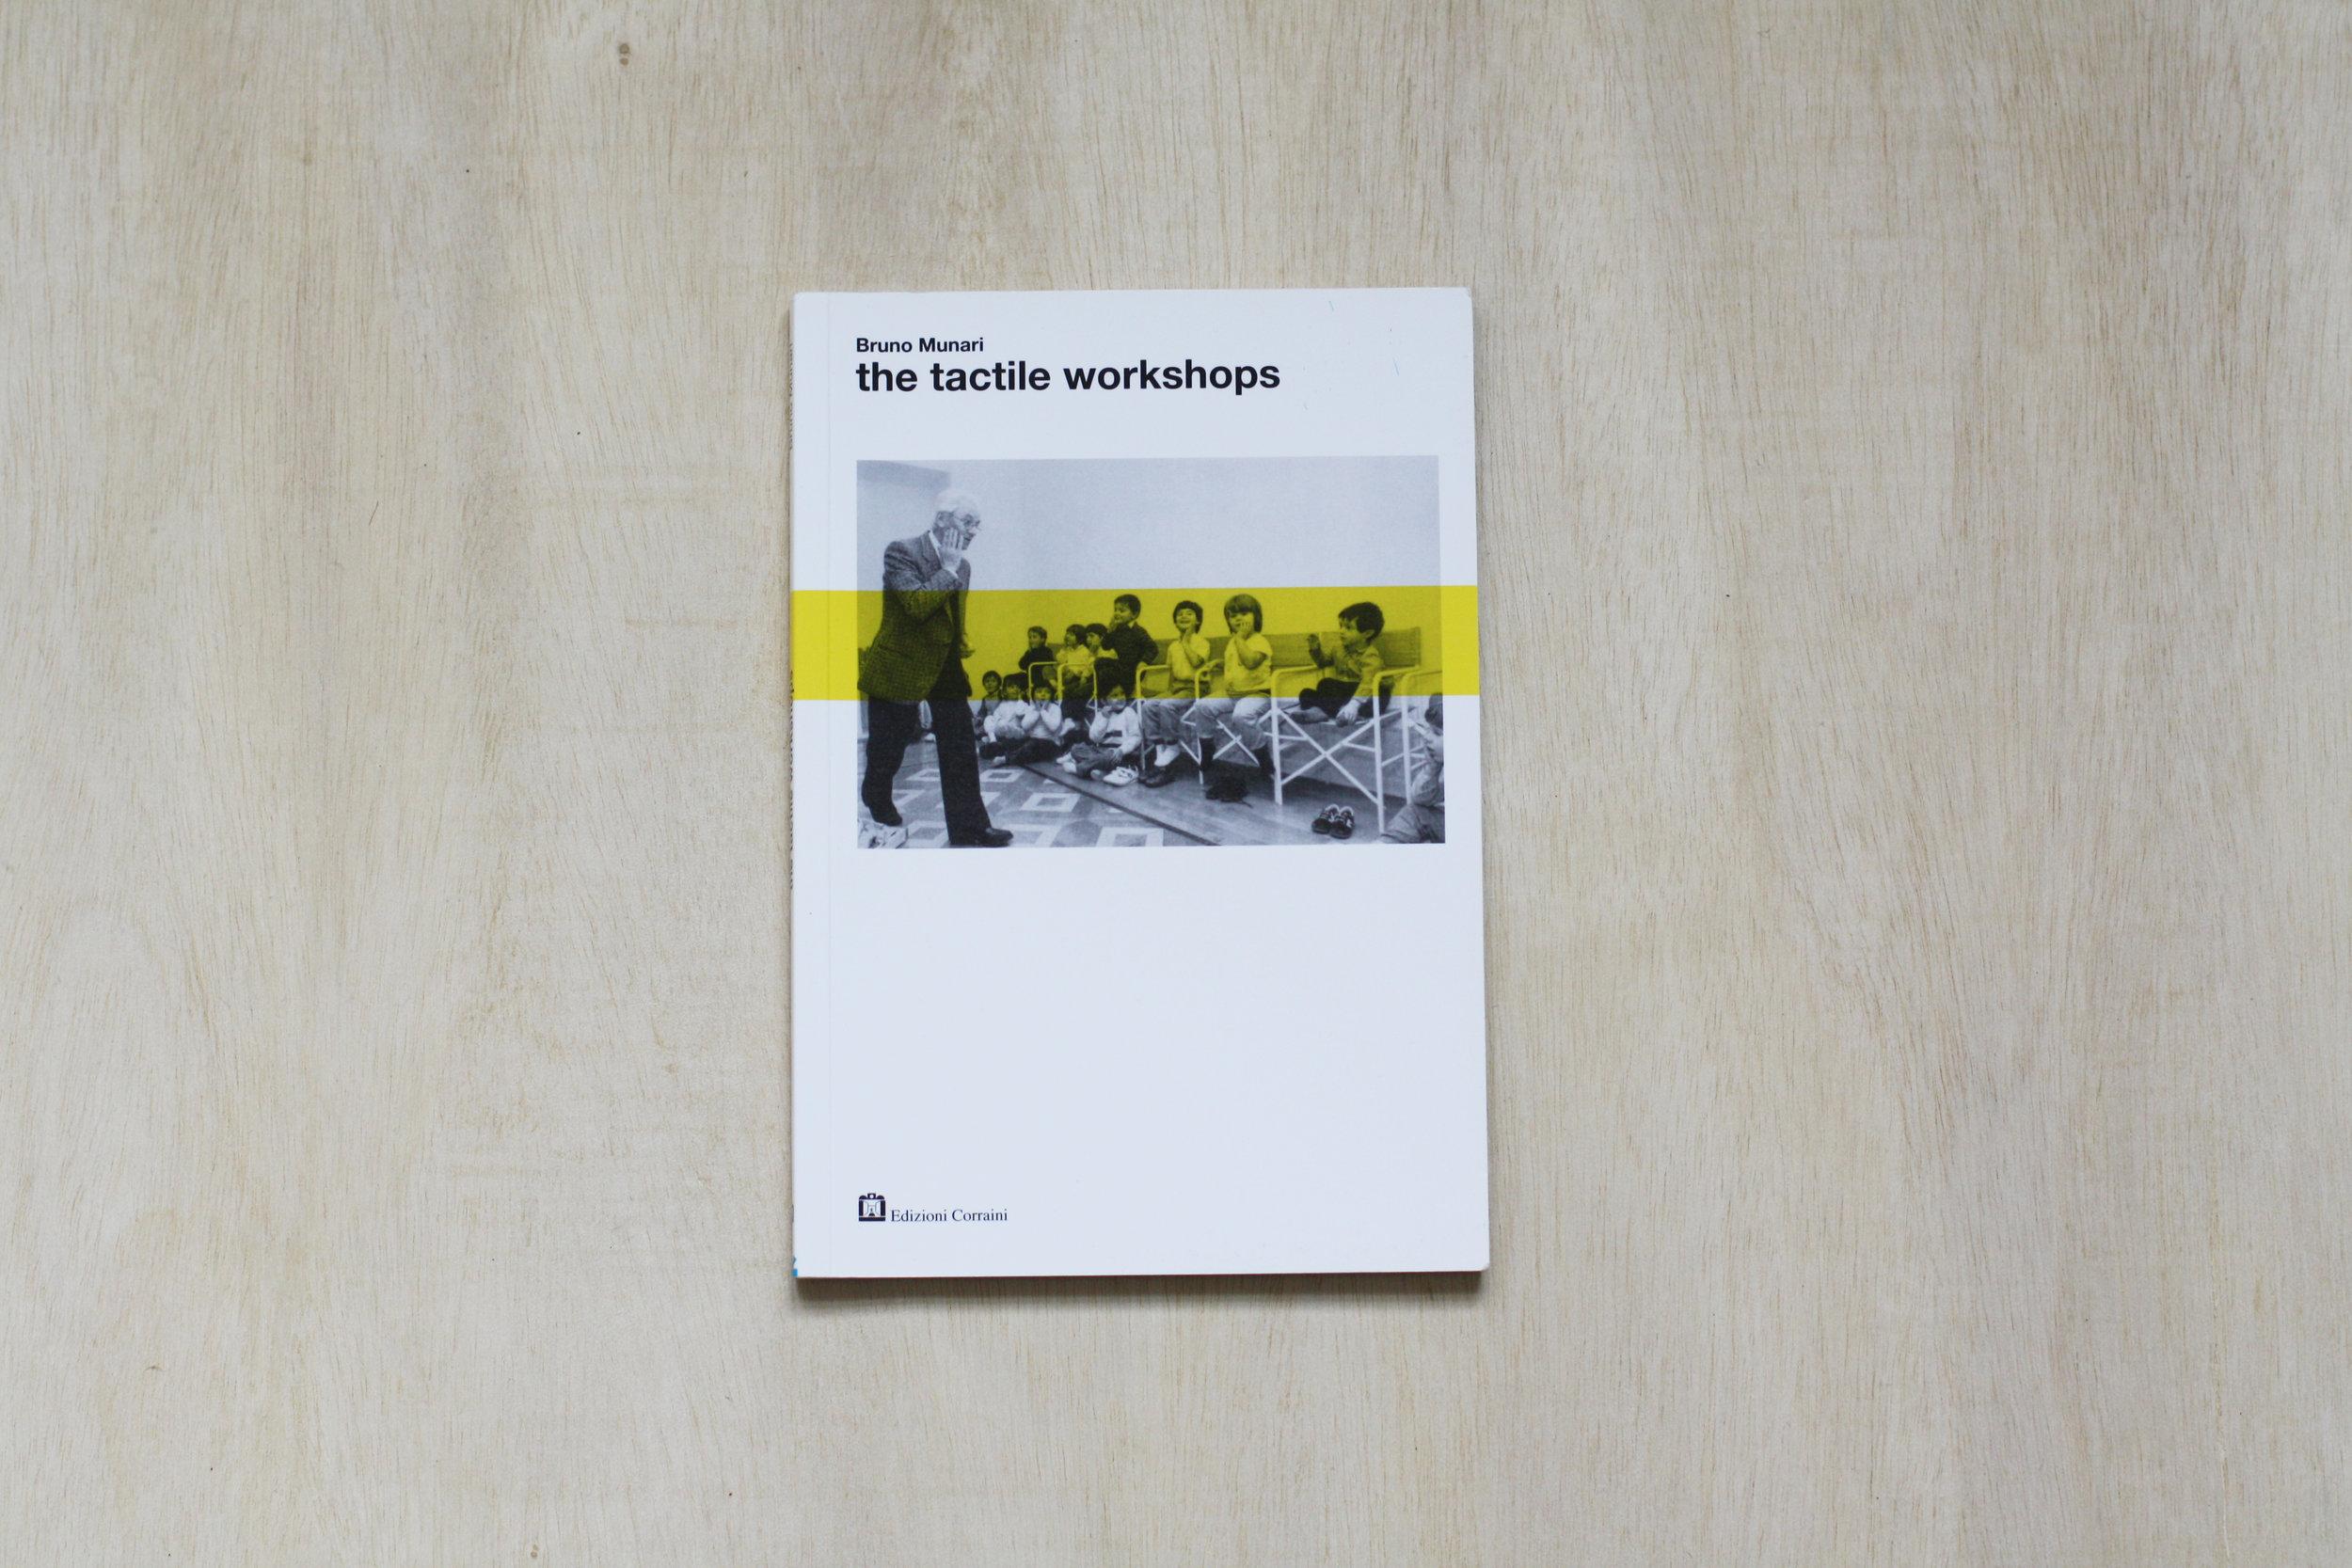 The Tactile Workshops  by Bruno Munari